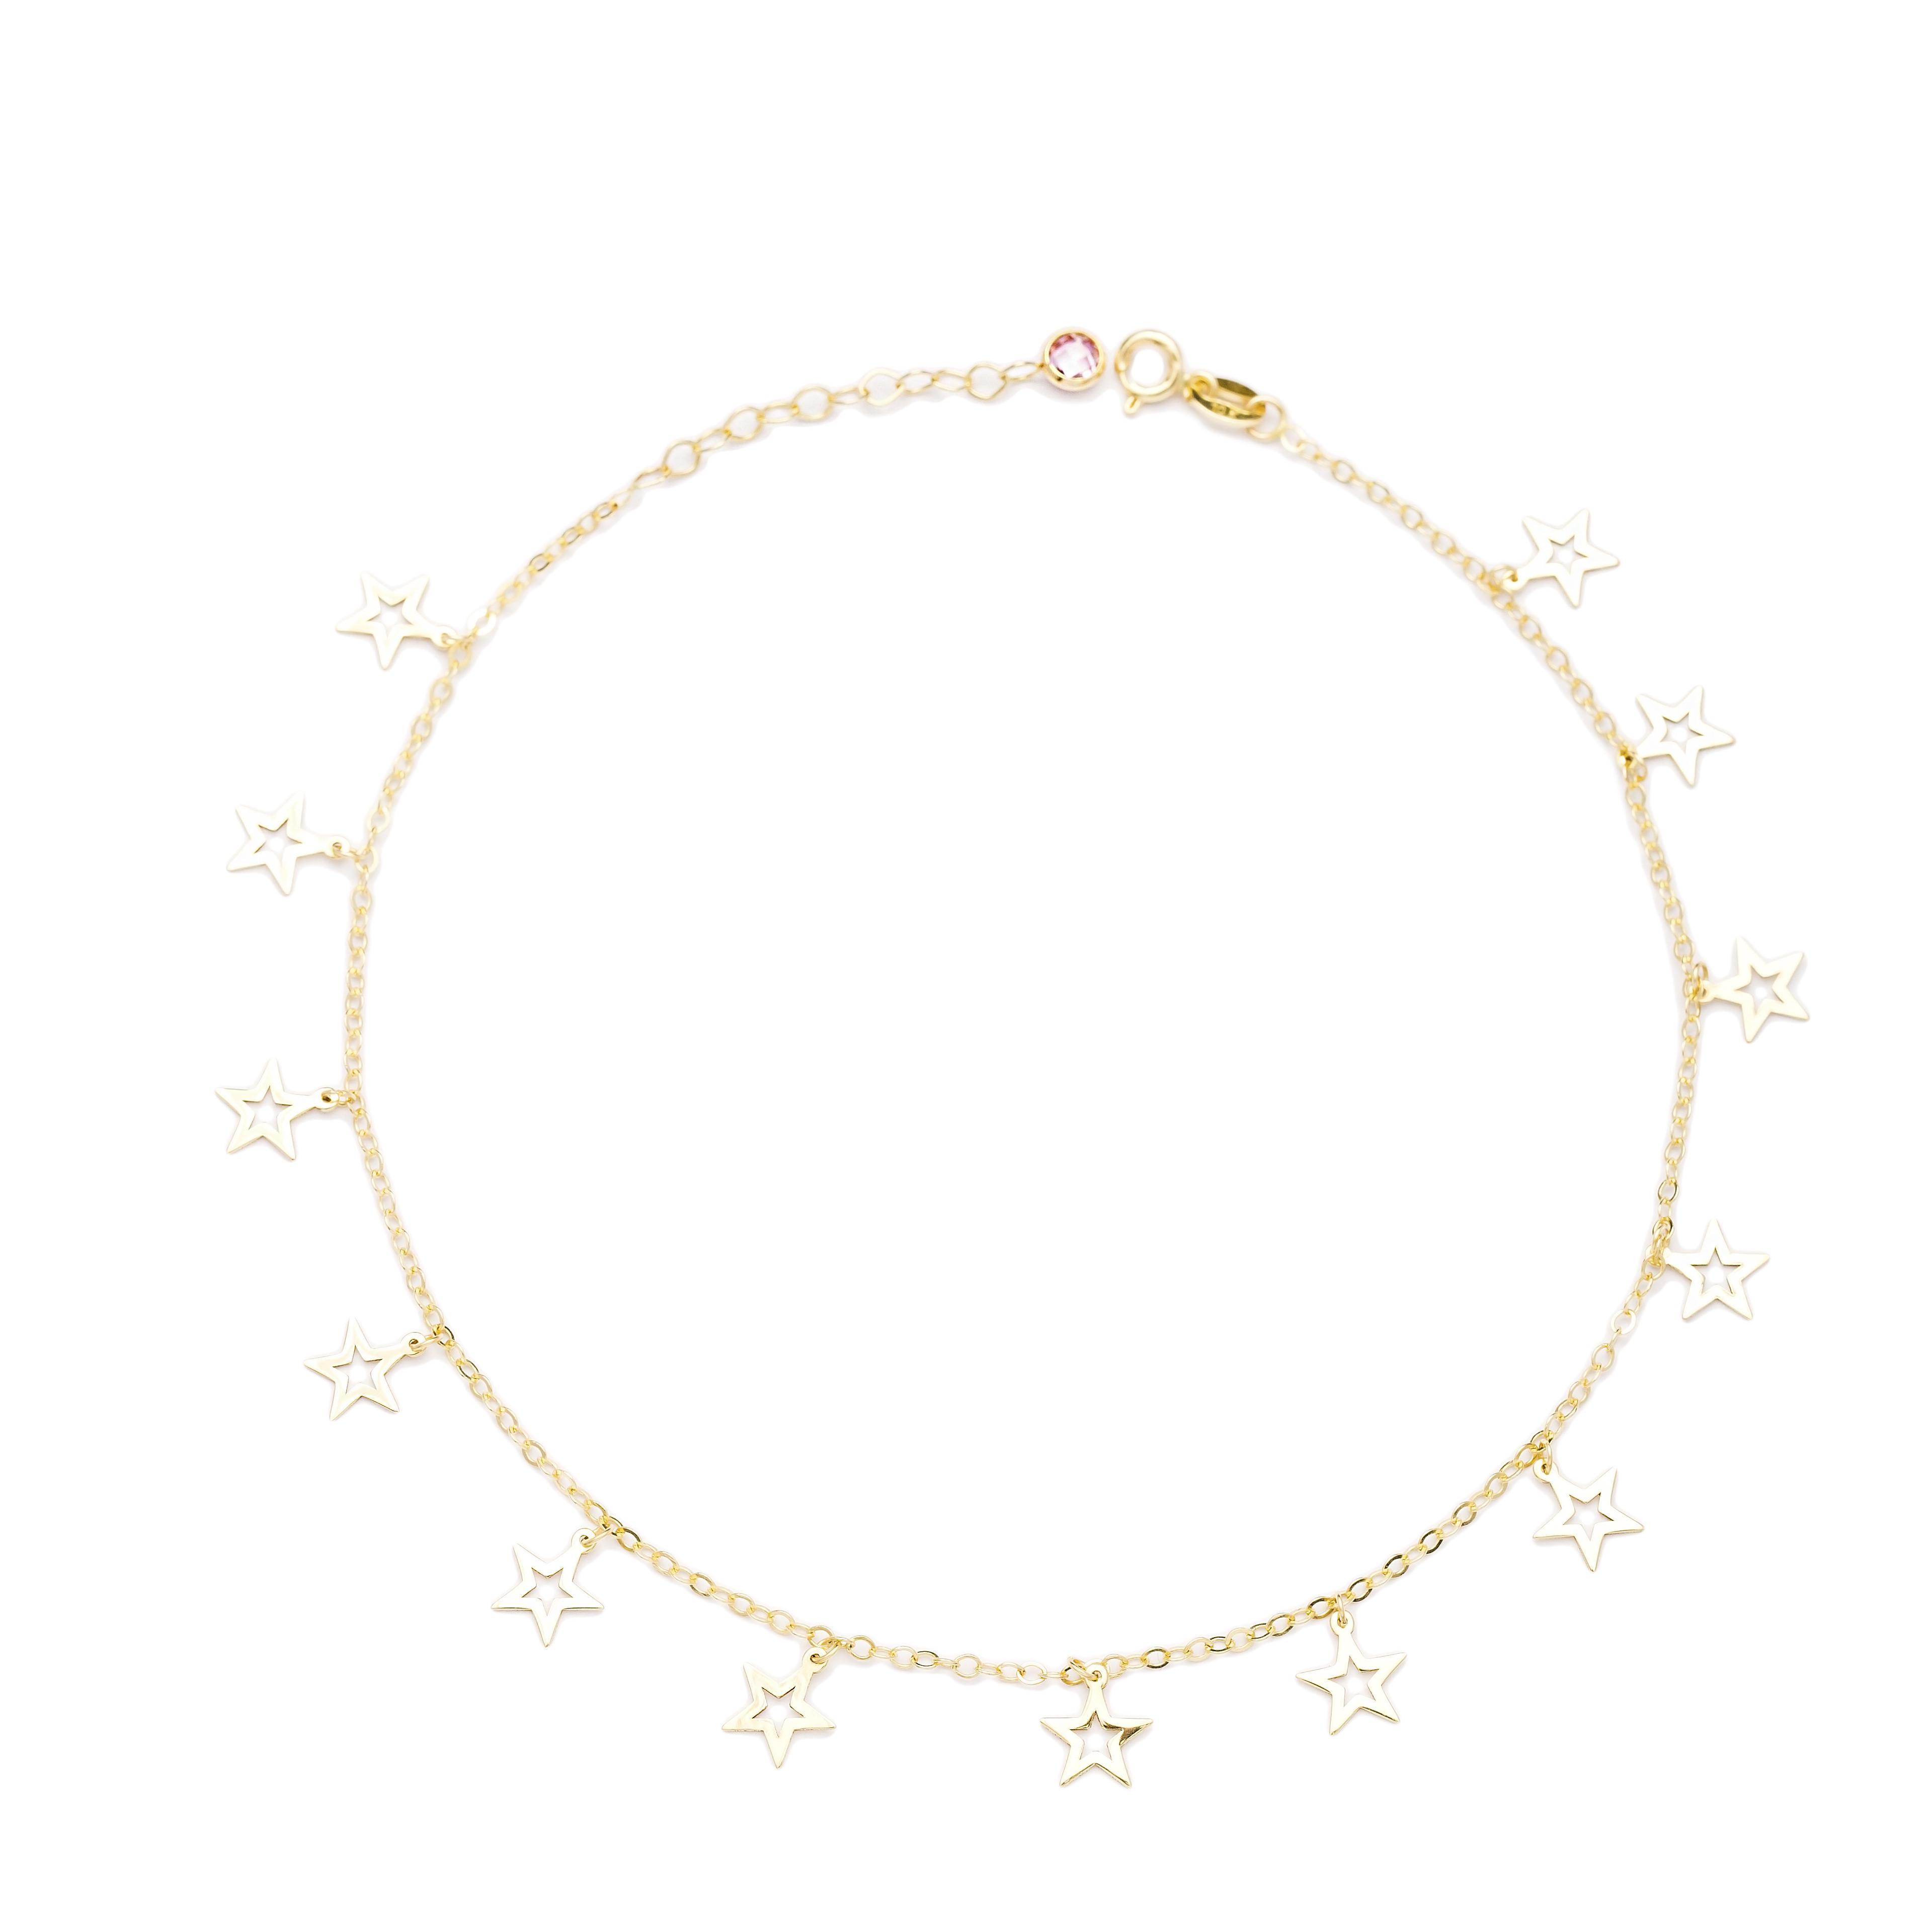 Shaker Minimalist Hollow Star Shape 10k Gold Anklet Turkish Wholesale Gold Jewelry